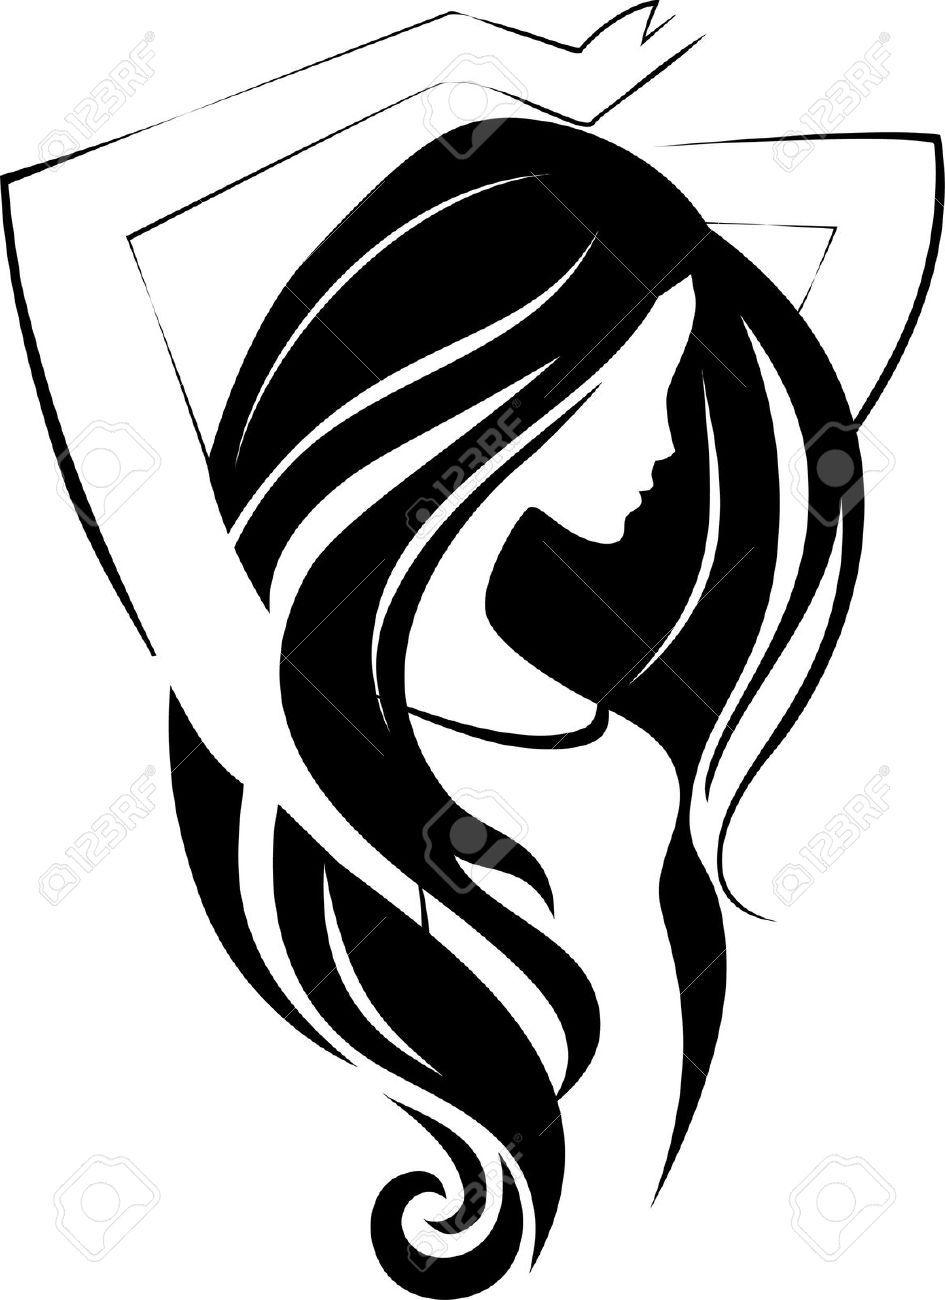 woman silhouette Google Search Girl icons, Art, Girl